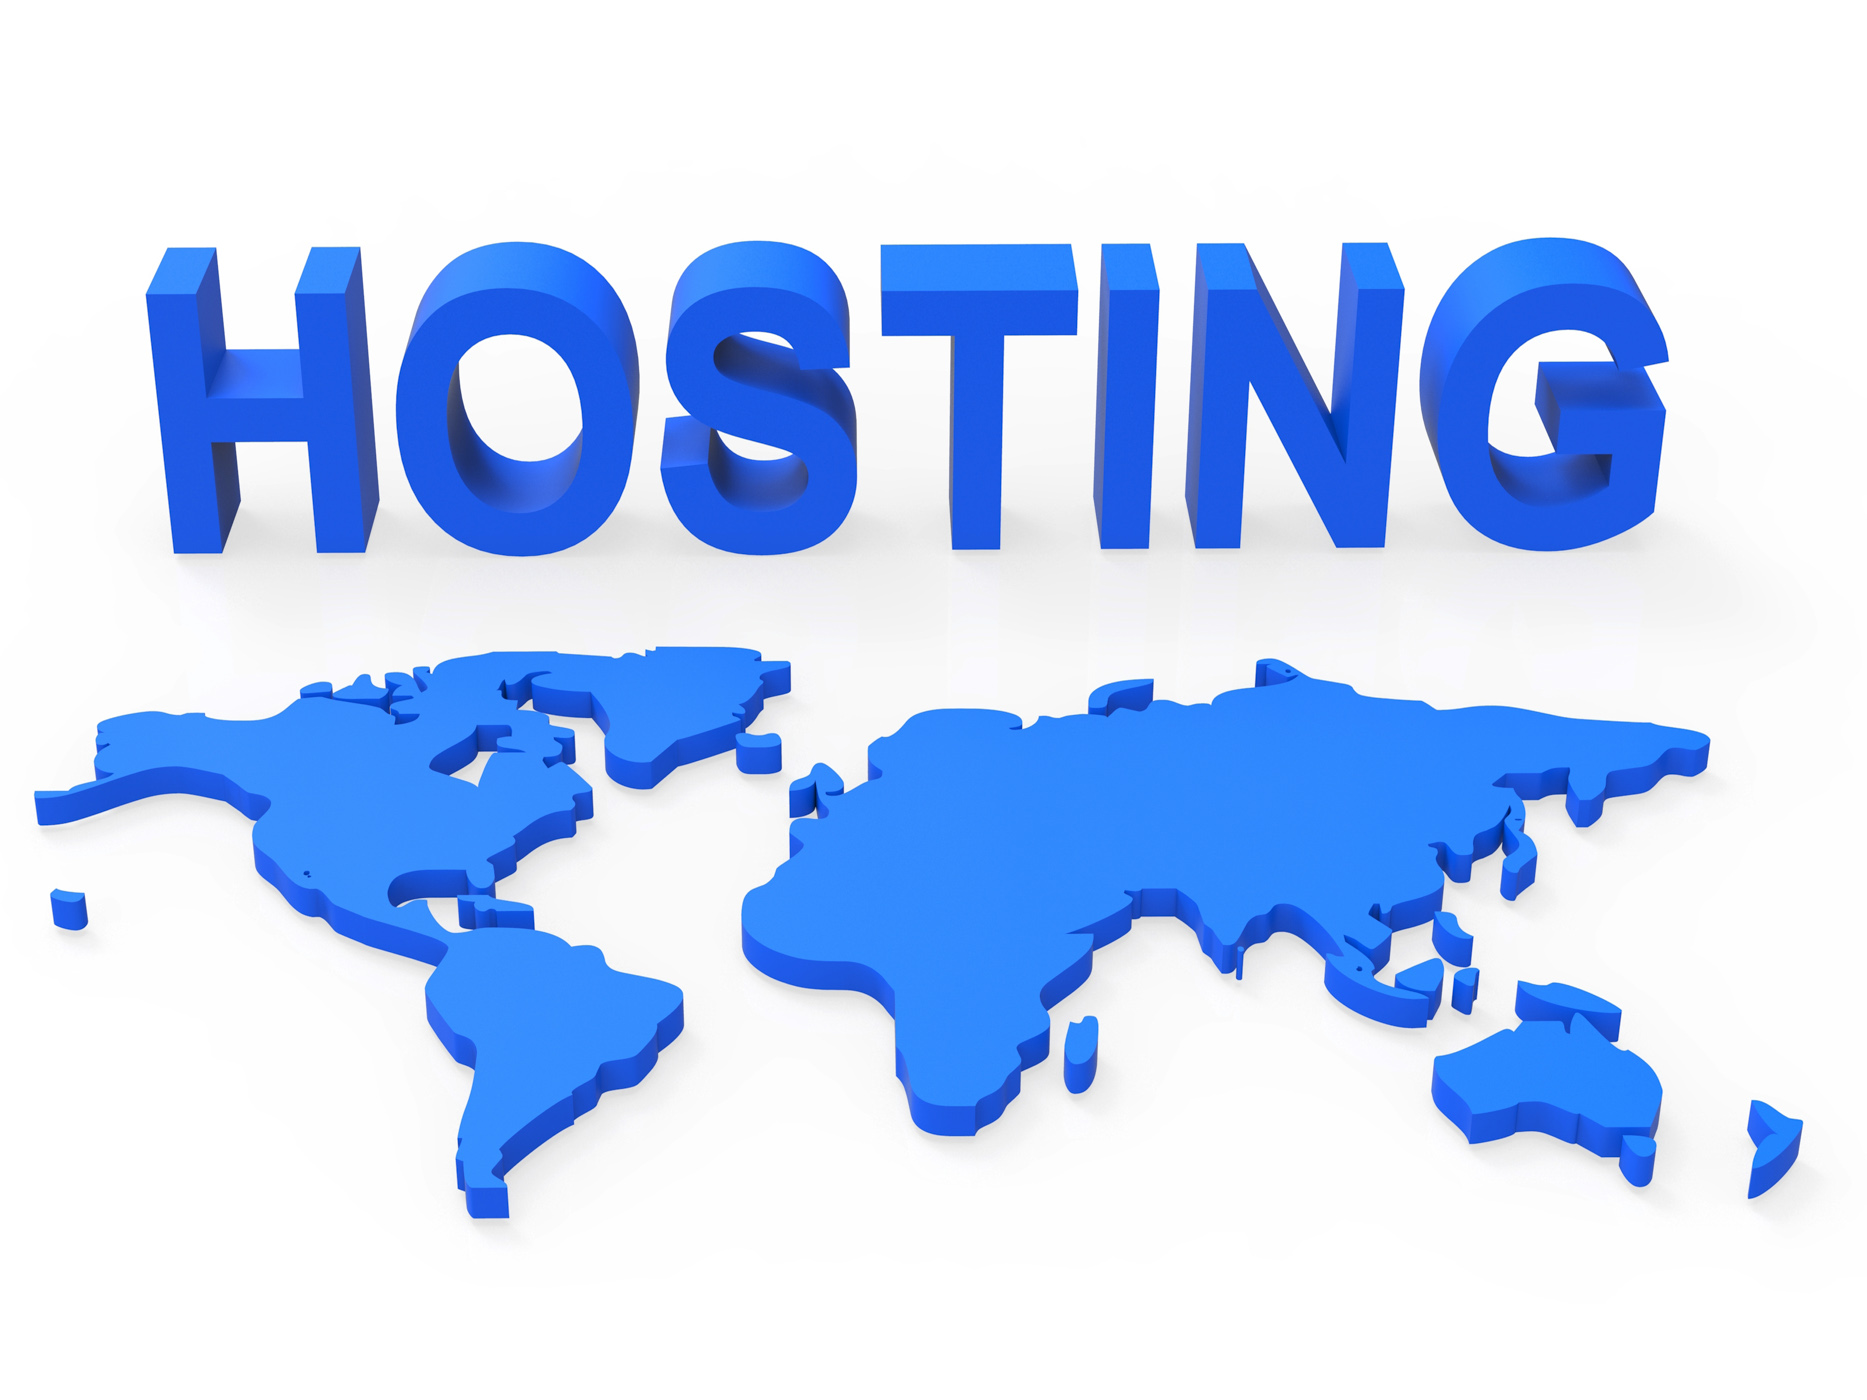 Hosting World Shows Earth Webhosting And Worldwide, Online, Worldwide, Worldly, World, HQ Photo